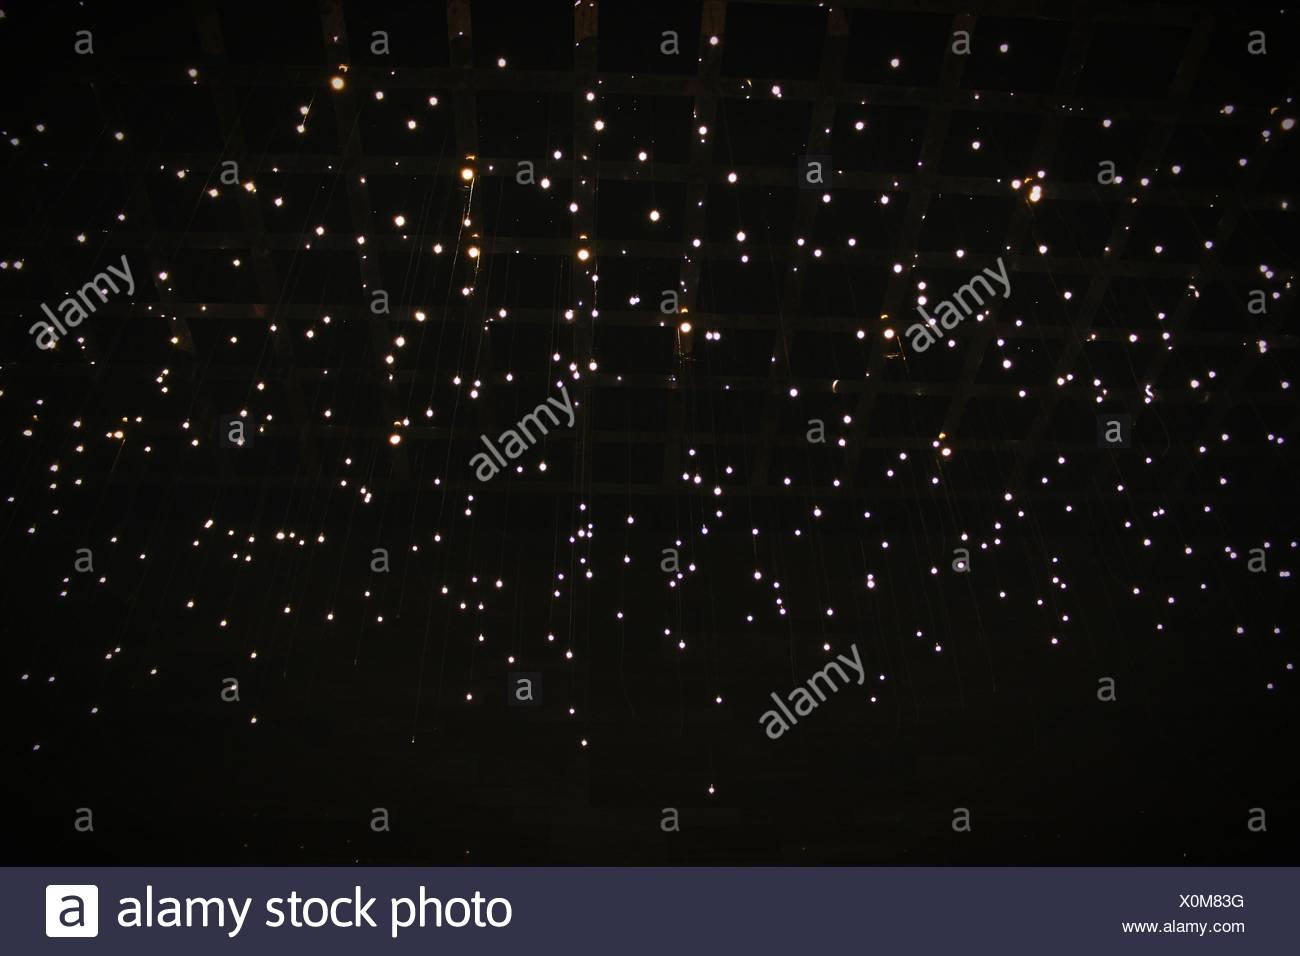 Low Angle View Of Stars On Dark Sky - Stock Image